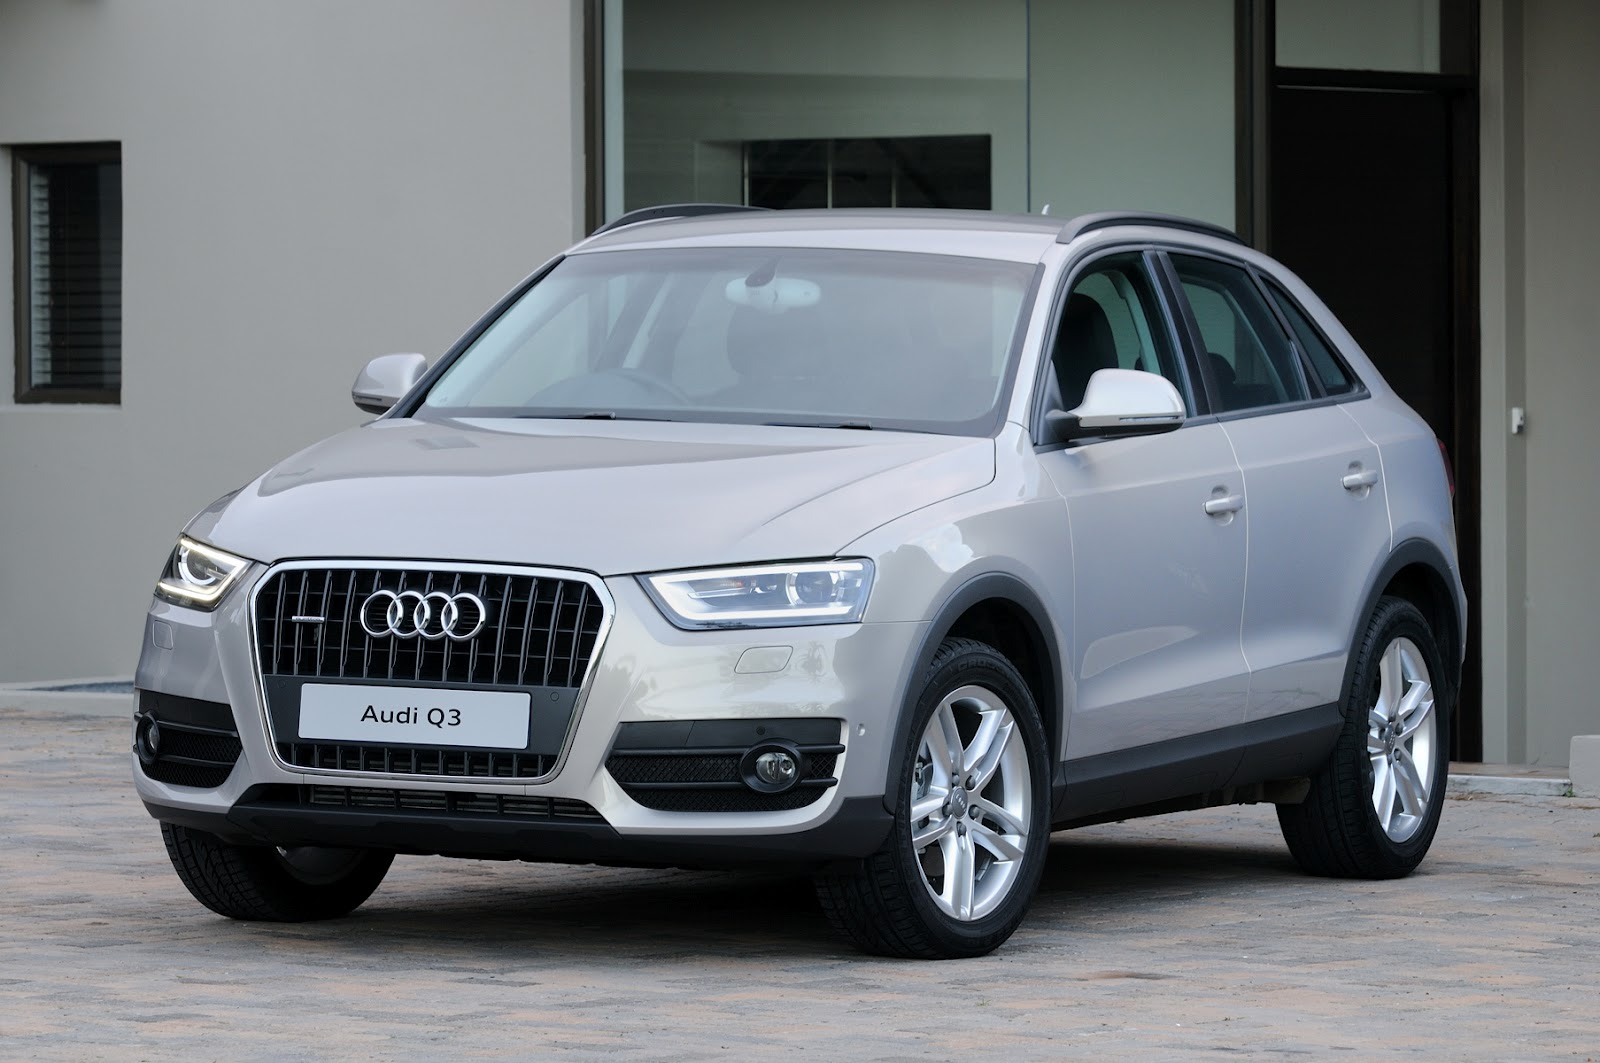 Ремонт и сервис Audi Q3